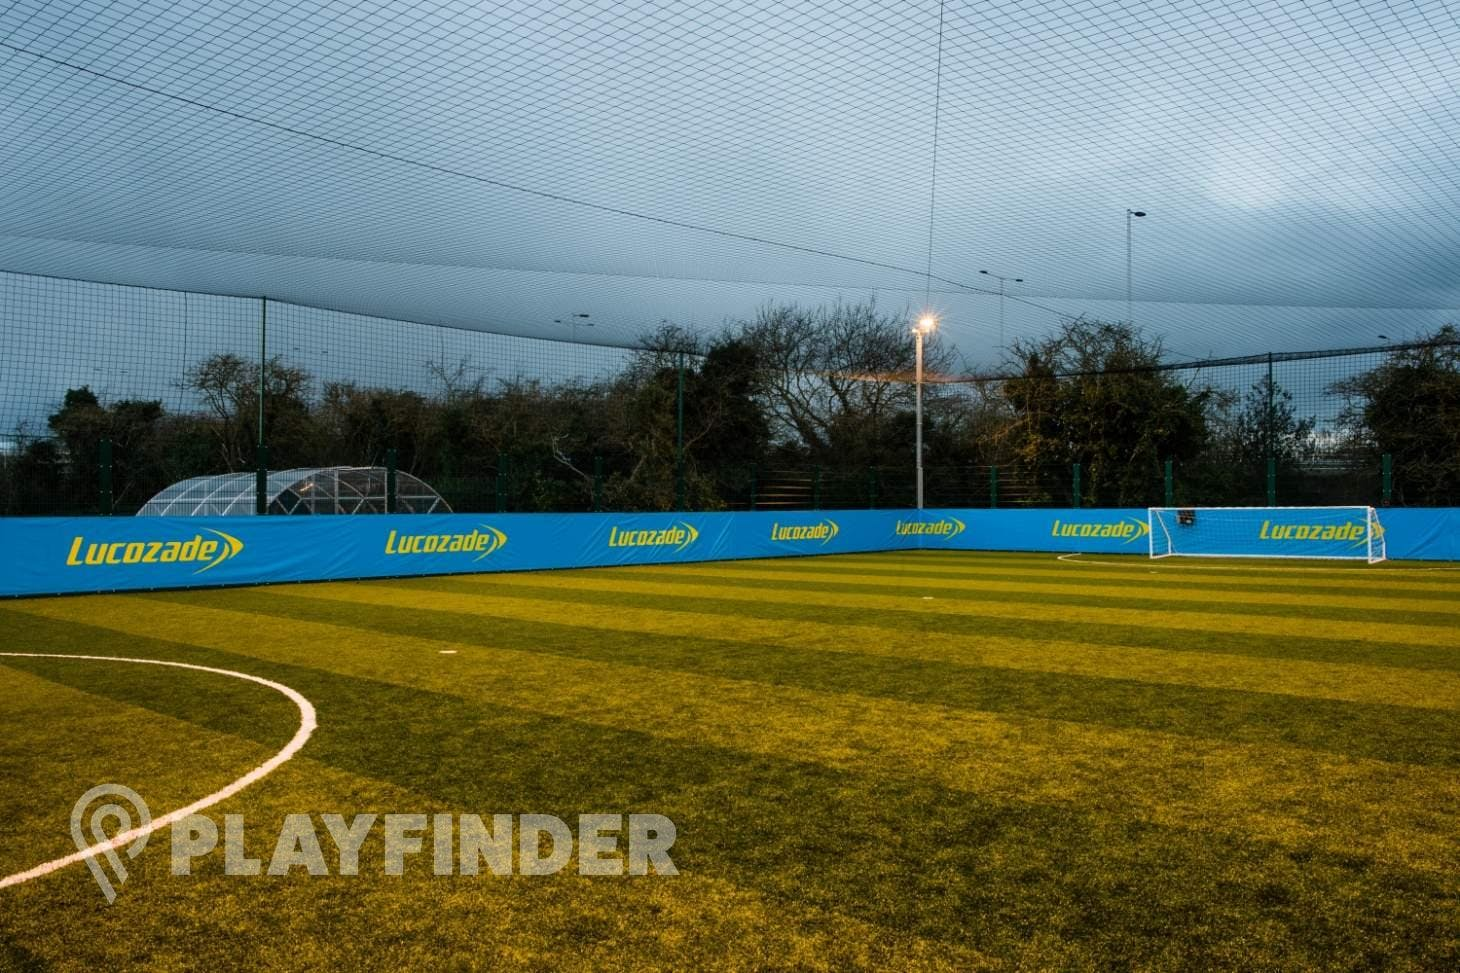 Powerleague Shepherd's Bush 5 a side | 3G Astroturf football pitch